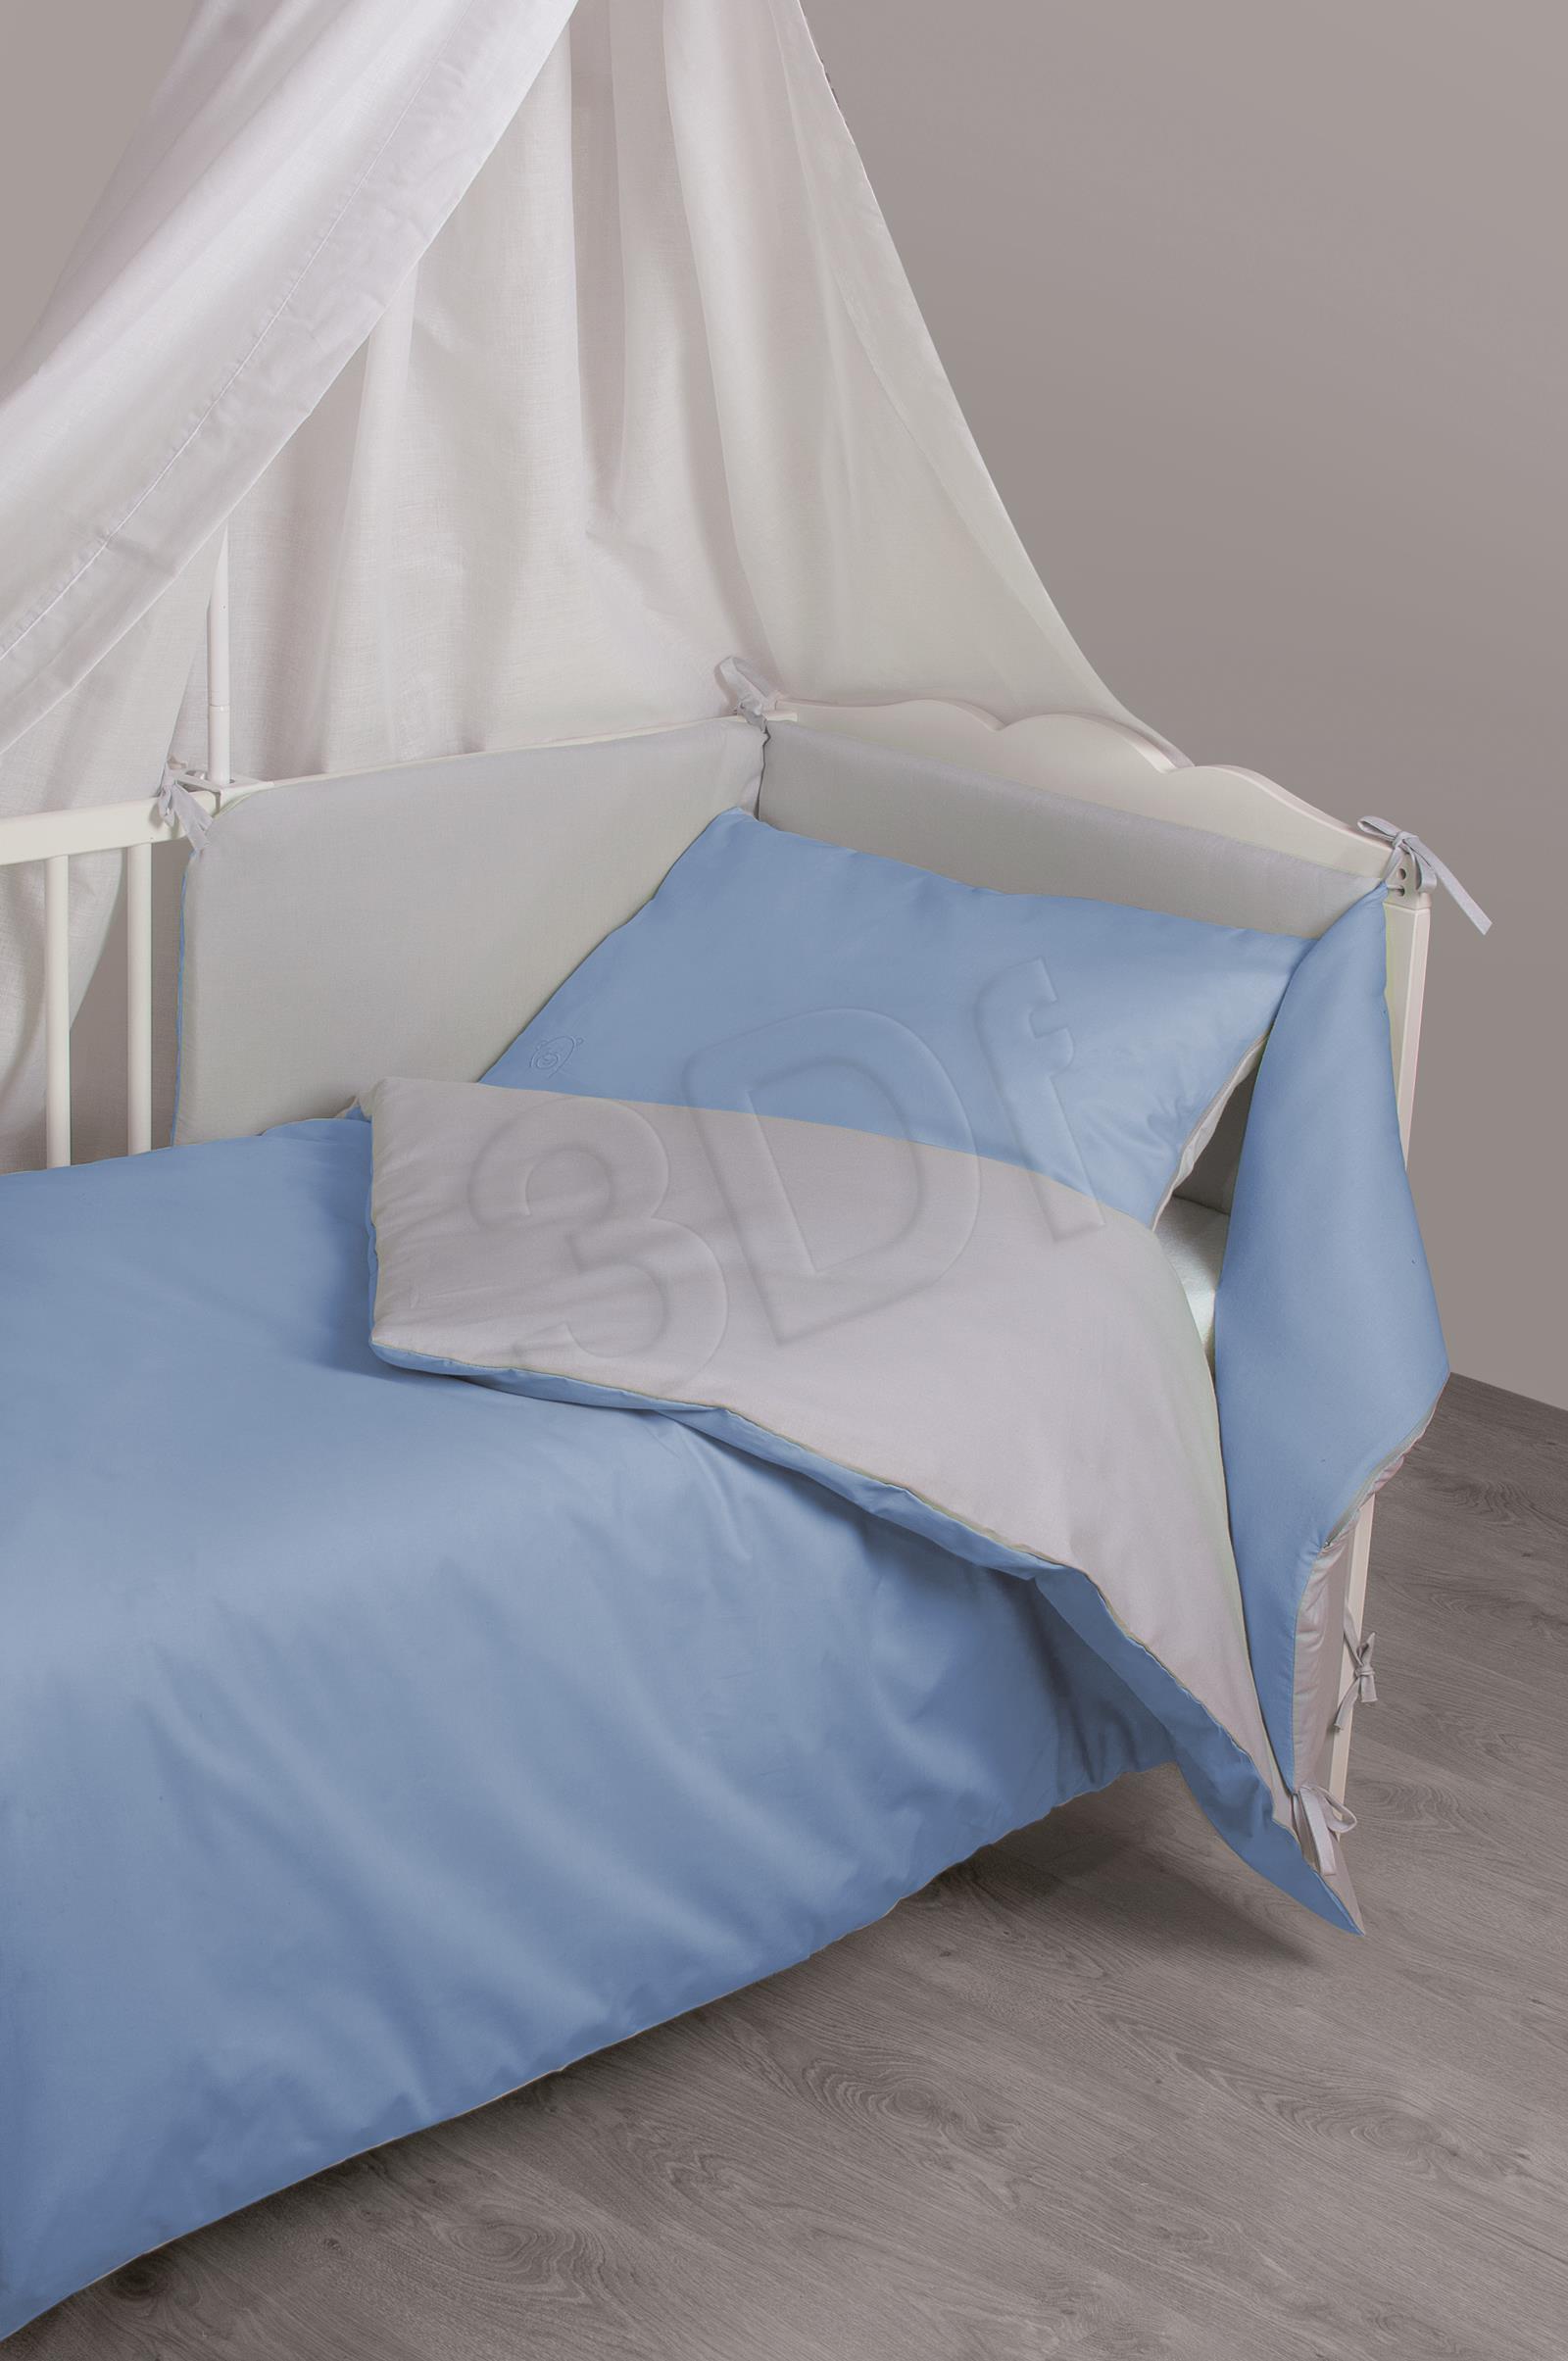 Bed linen Matex TDOBW2-24 (135x100 cm, 40x60 cm; blue color, gray color) TDOBW2-24 Gultas veļa